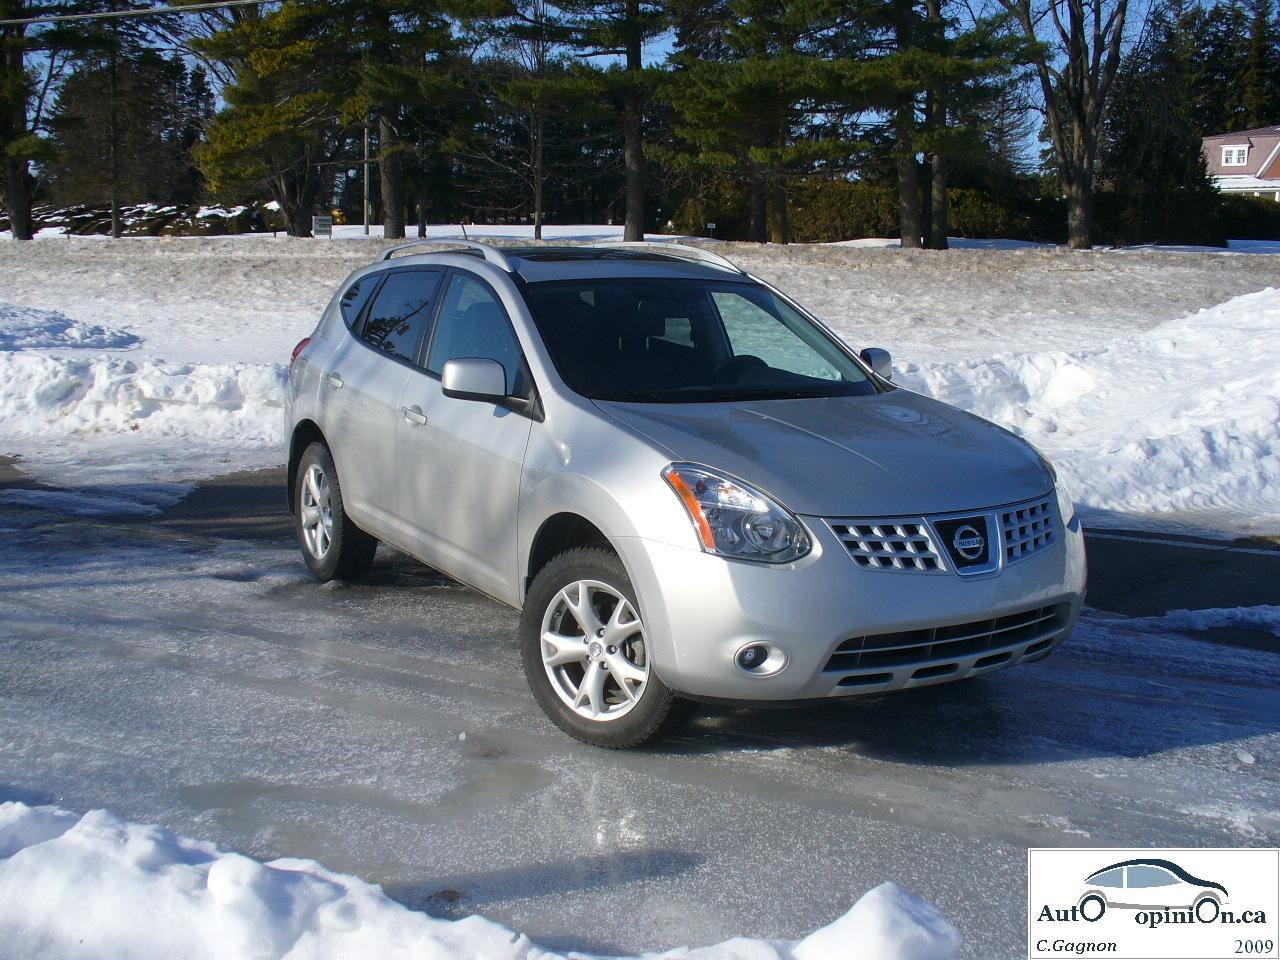 Essai routier complet: Nissan Rogue 2009